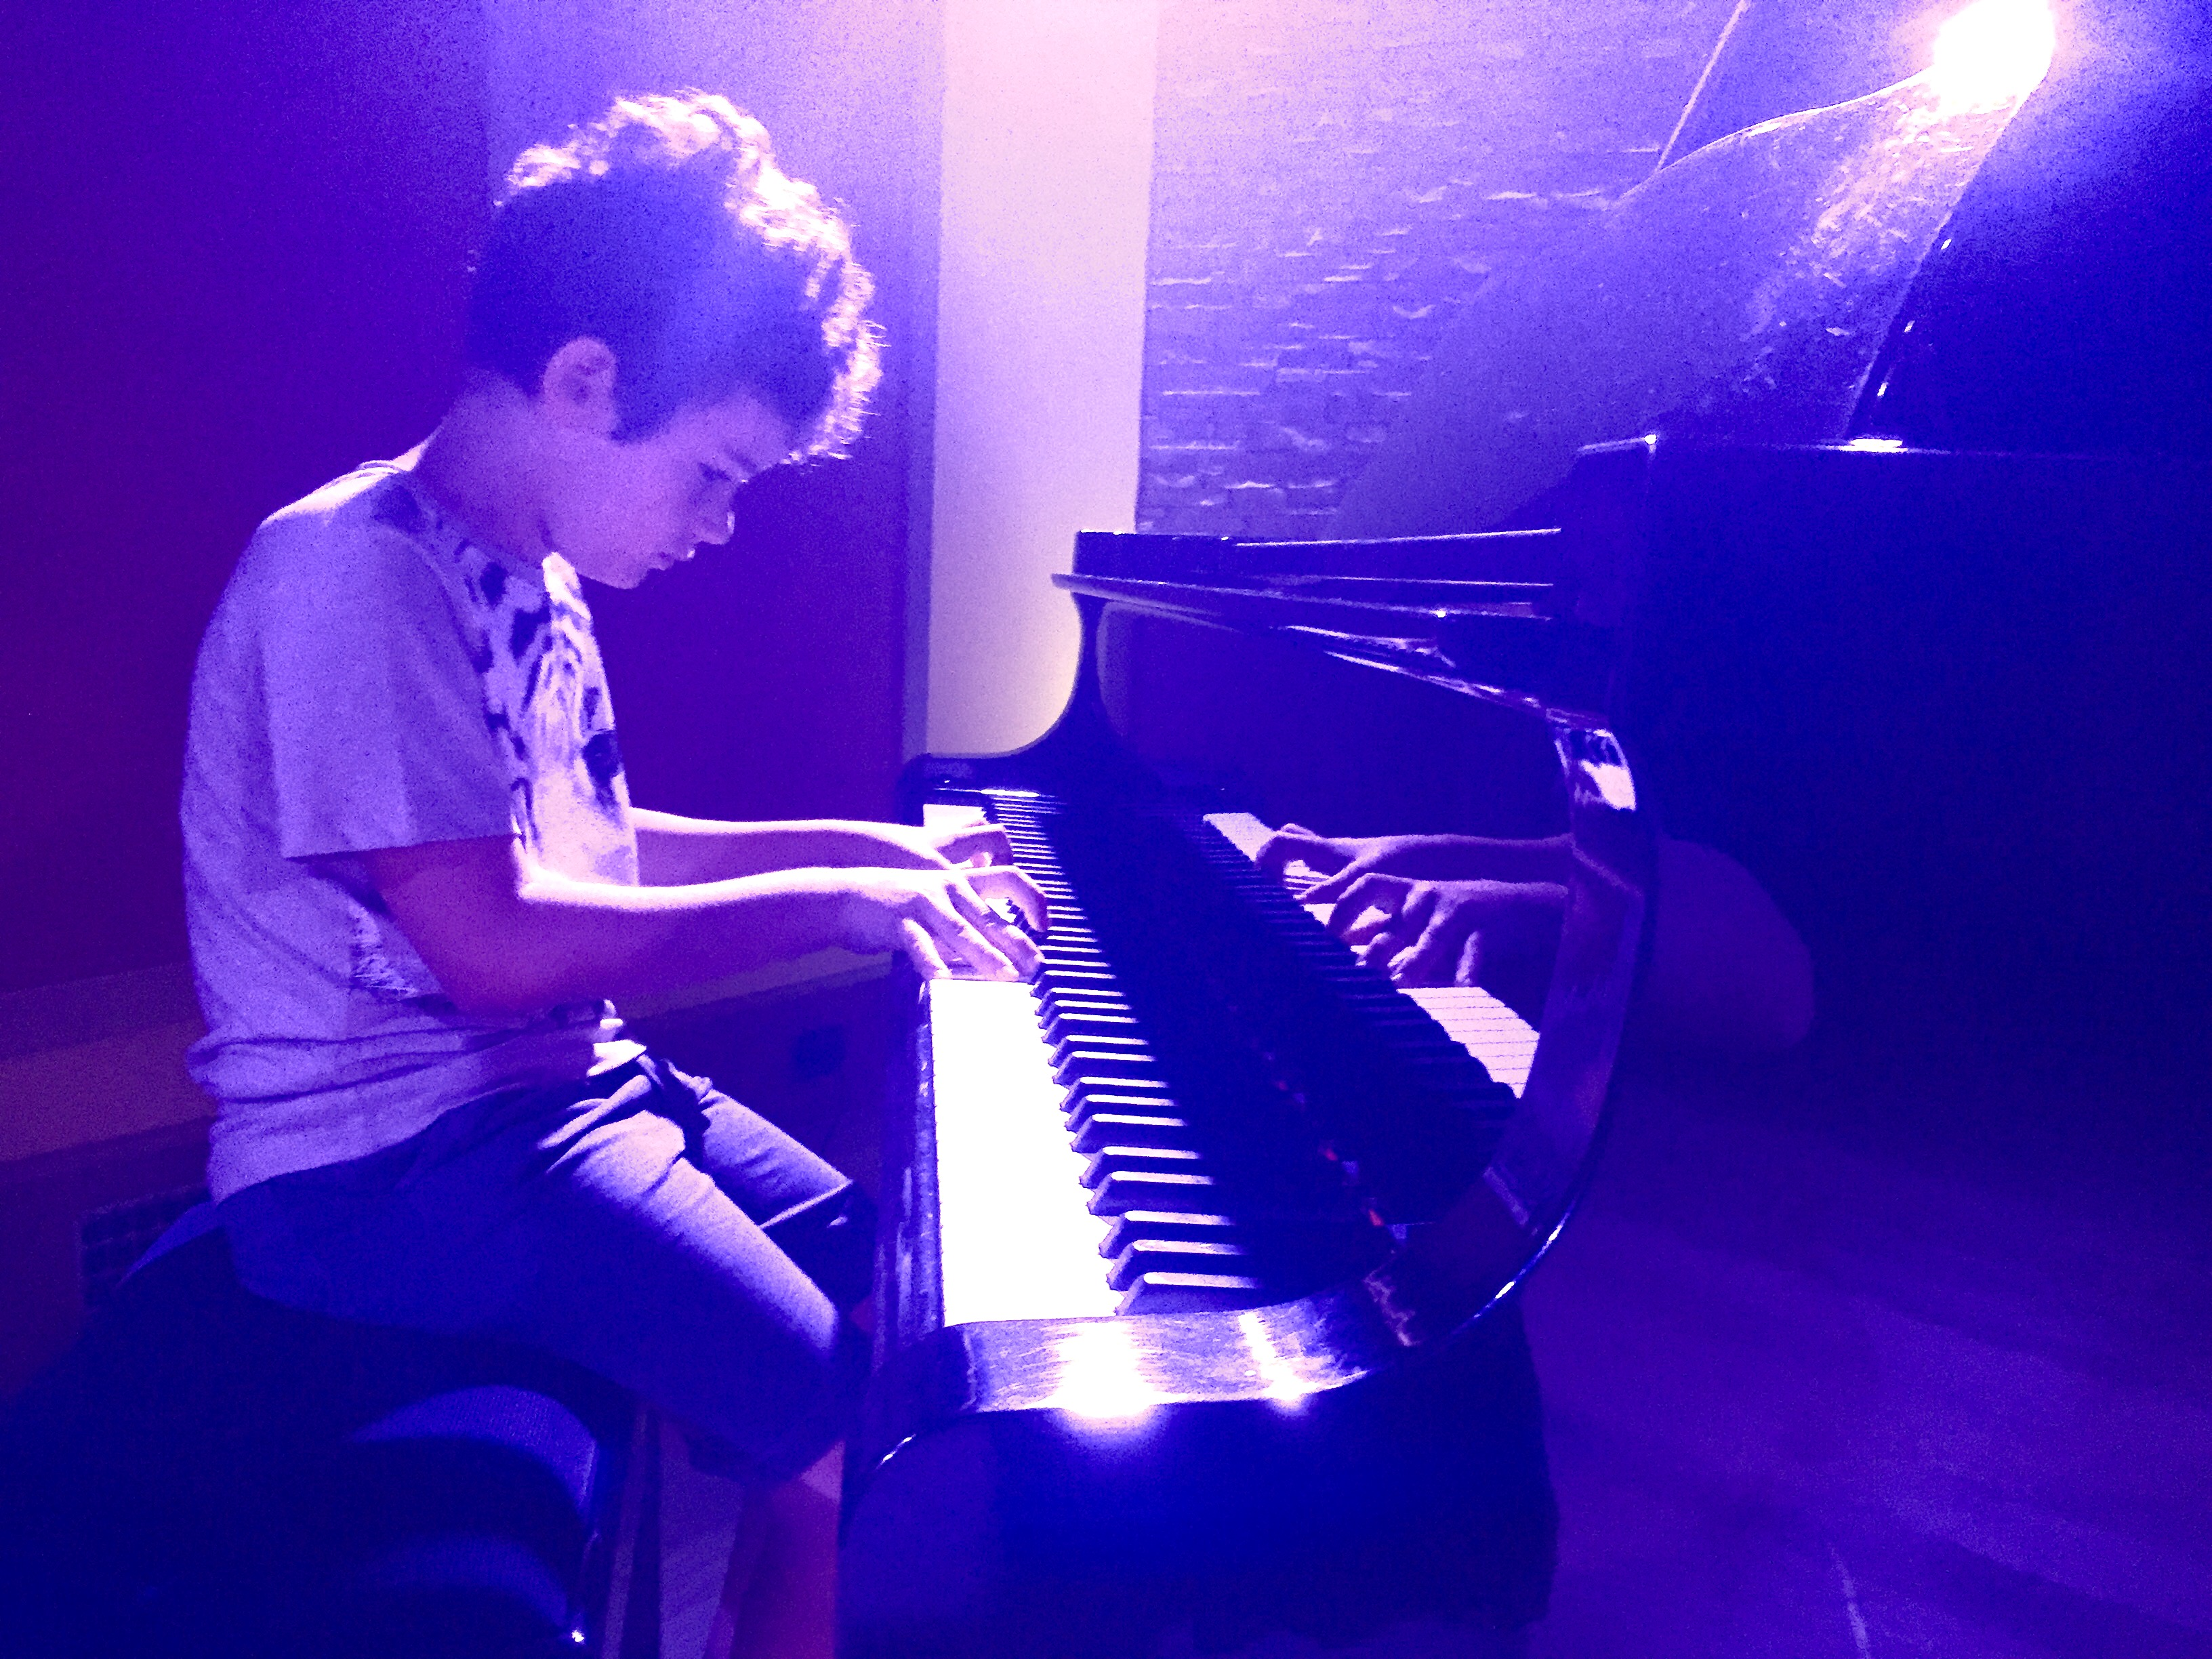 LUCIO PIANOFORTE